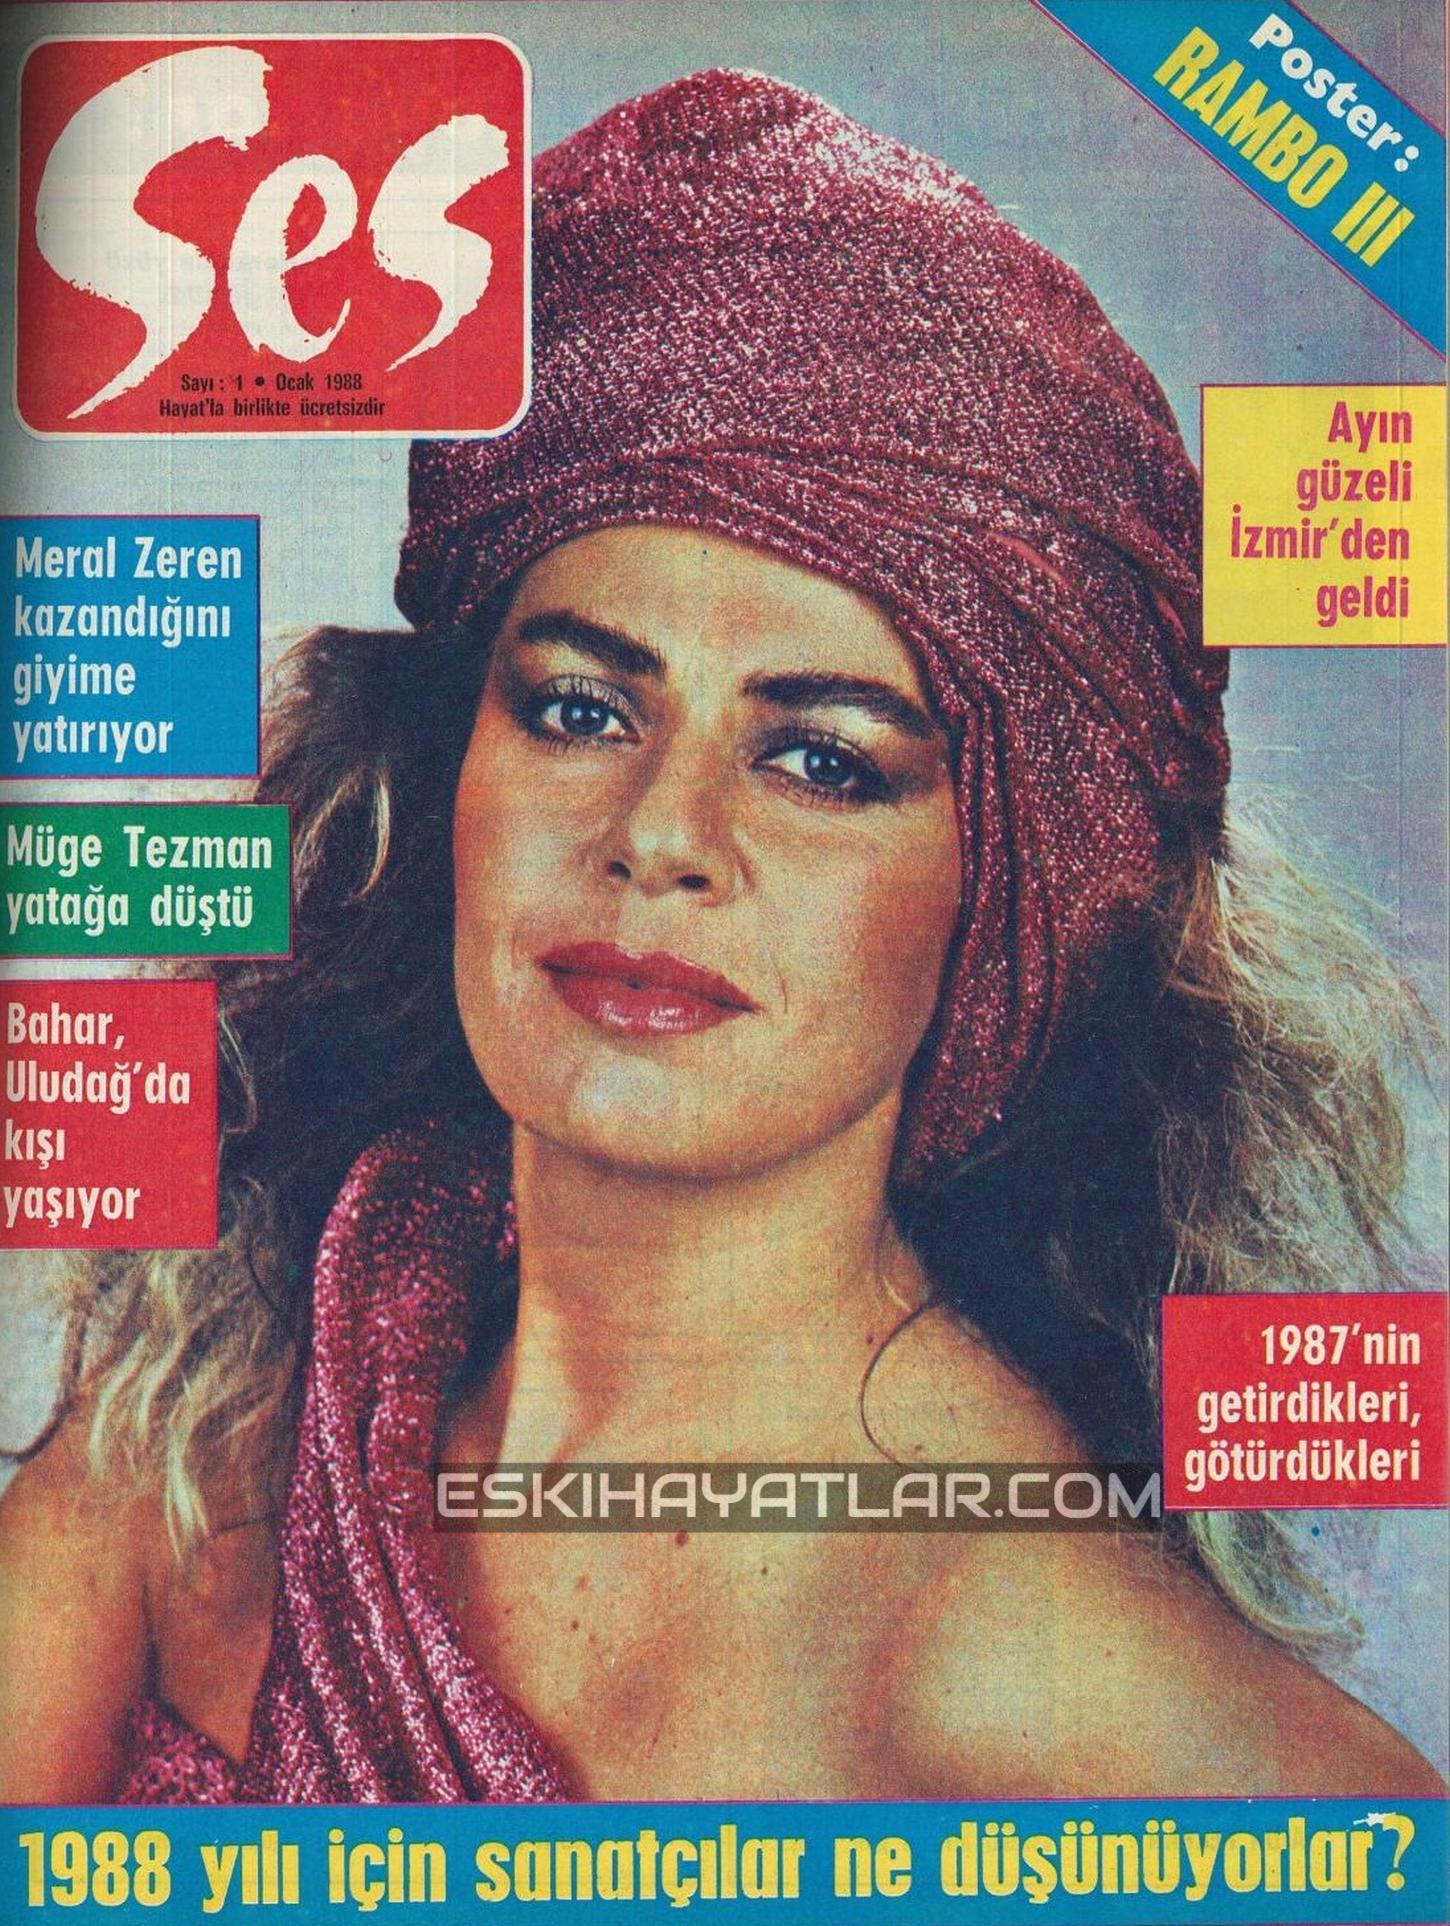 80-li-yillarda-video-kaset-firtinasi-vhs-betamax-kiralama (4)